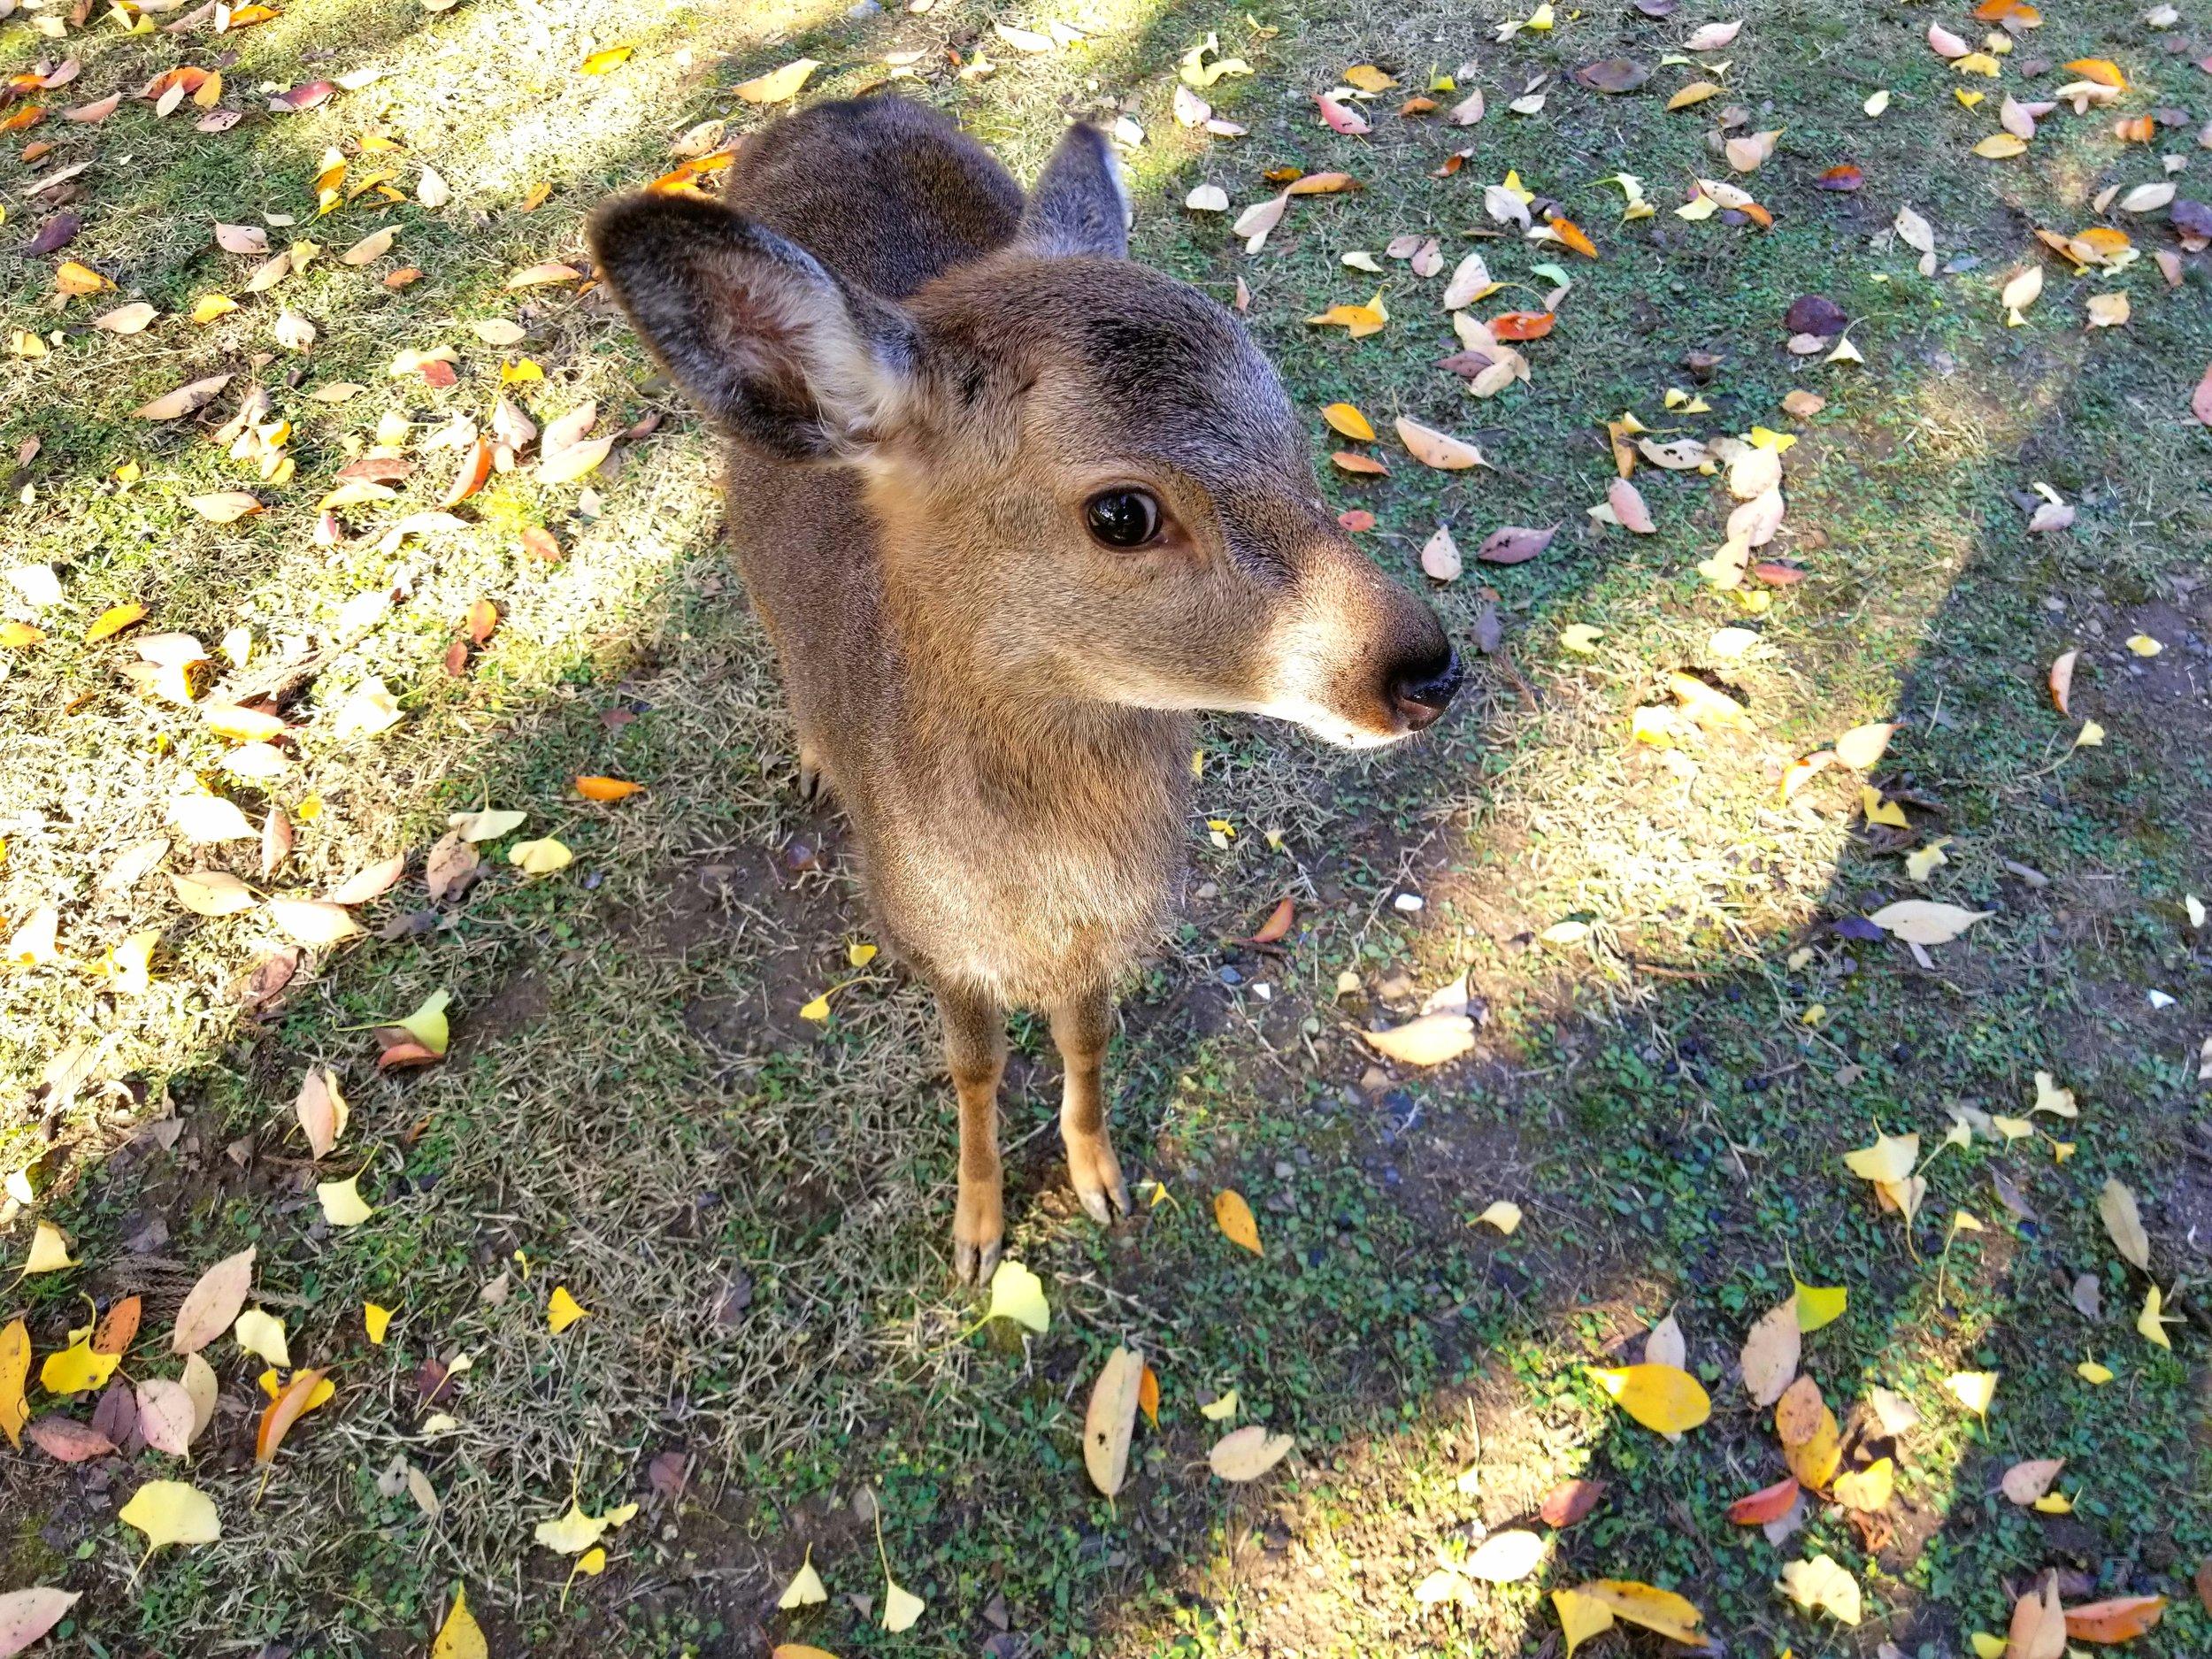 uprooted-traveler-nara-park-vegan-guide-kyoto-deer